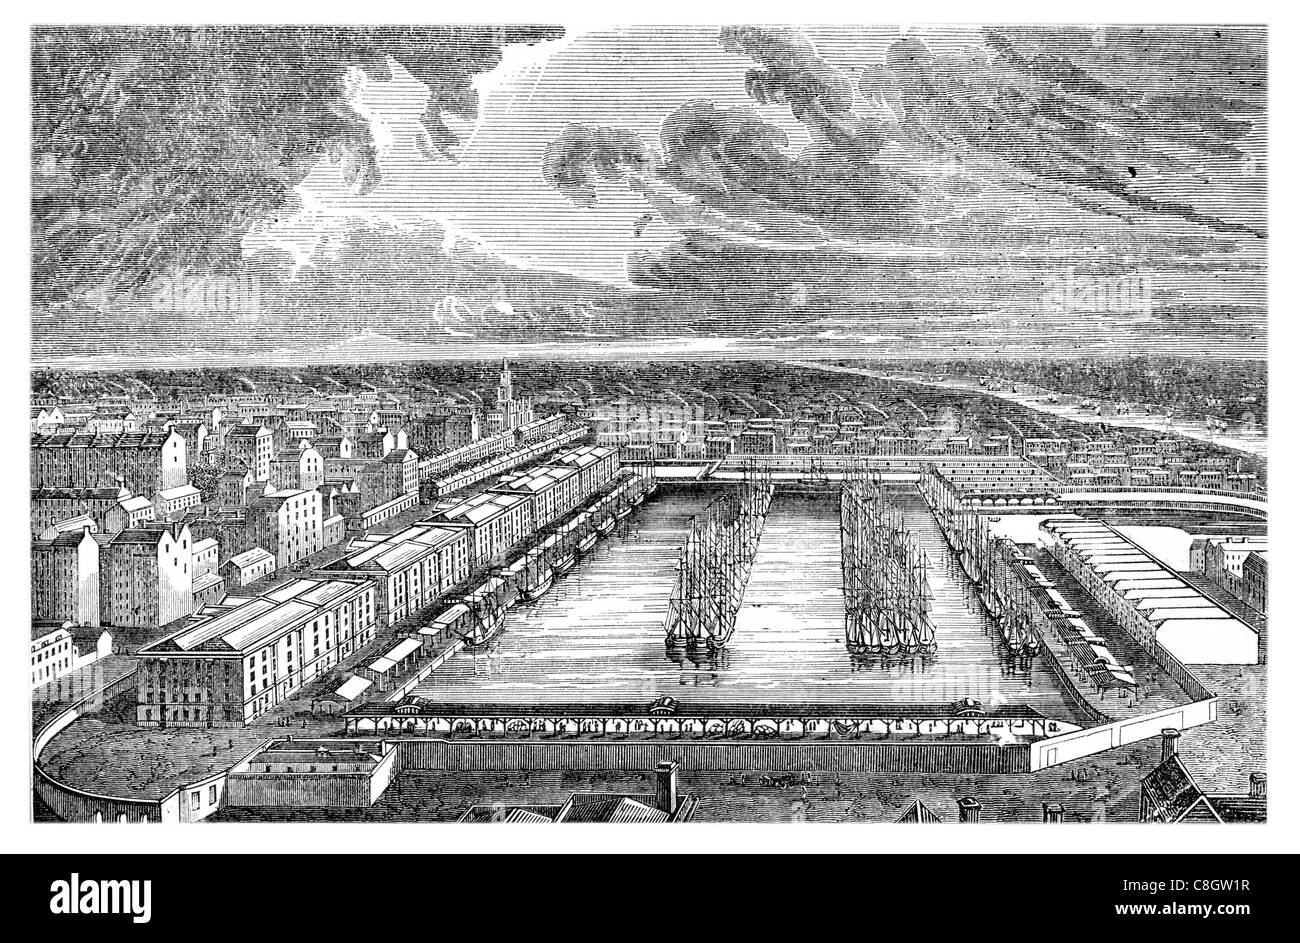 1313-london-docks-dock-historic-port-lon